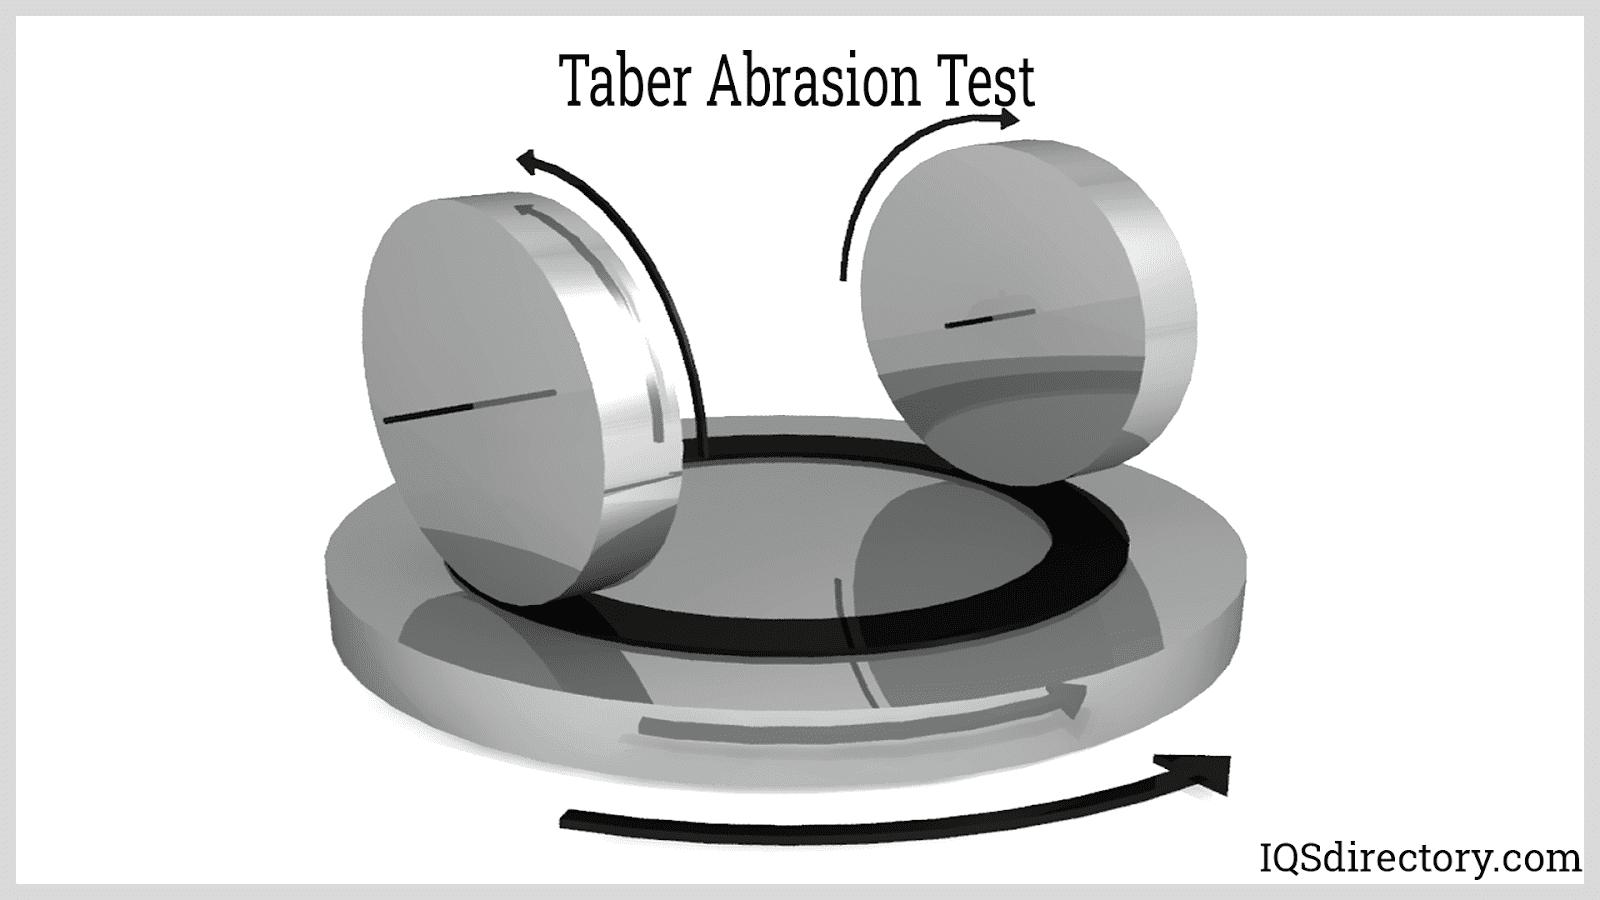 Taber Abrasion Test